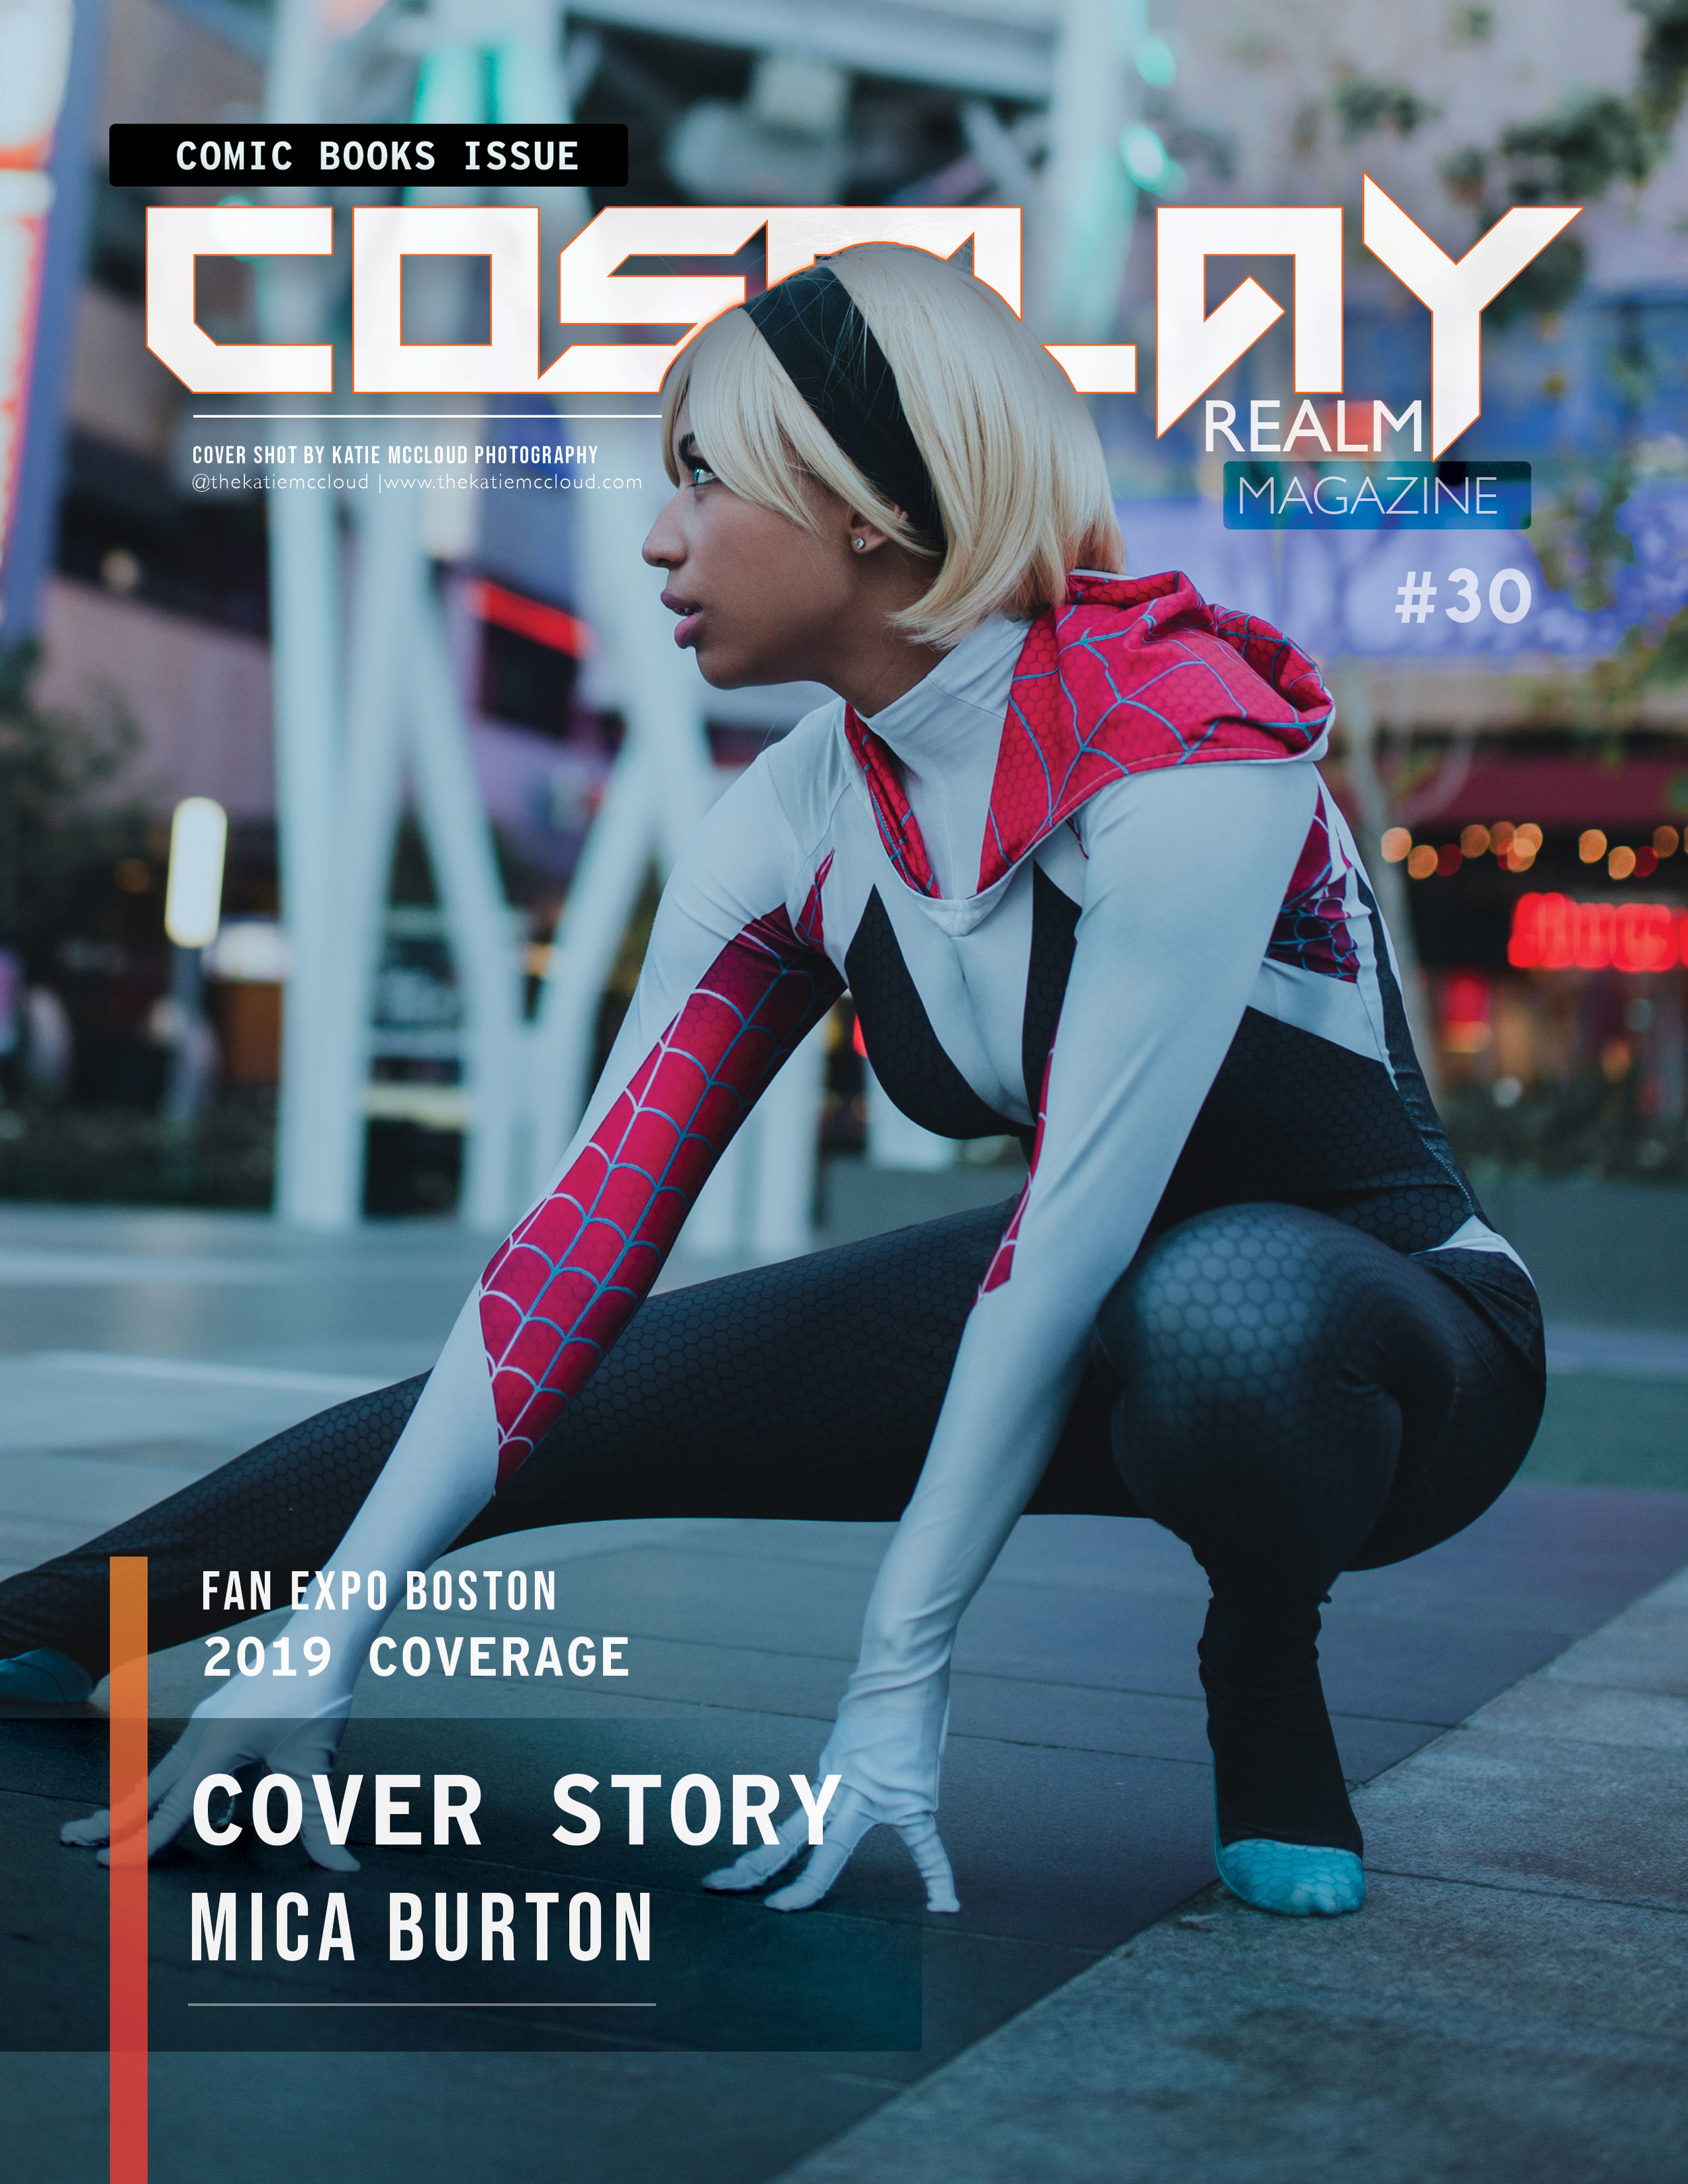 Cover Story: Mica Burton - COMIC BOOKS ISSUE